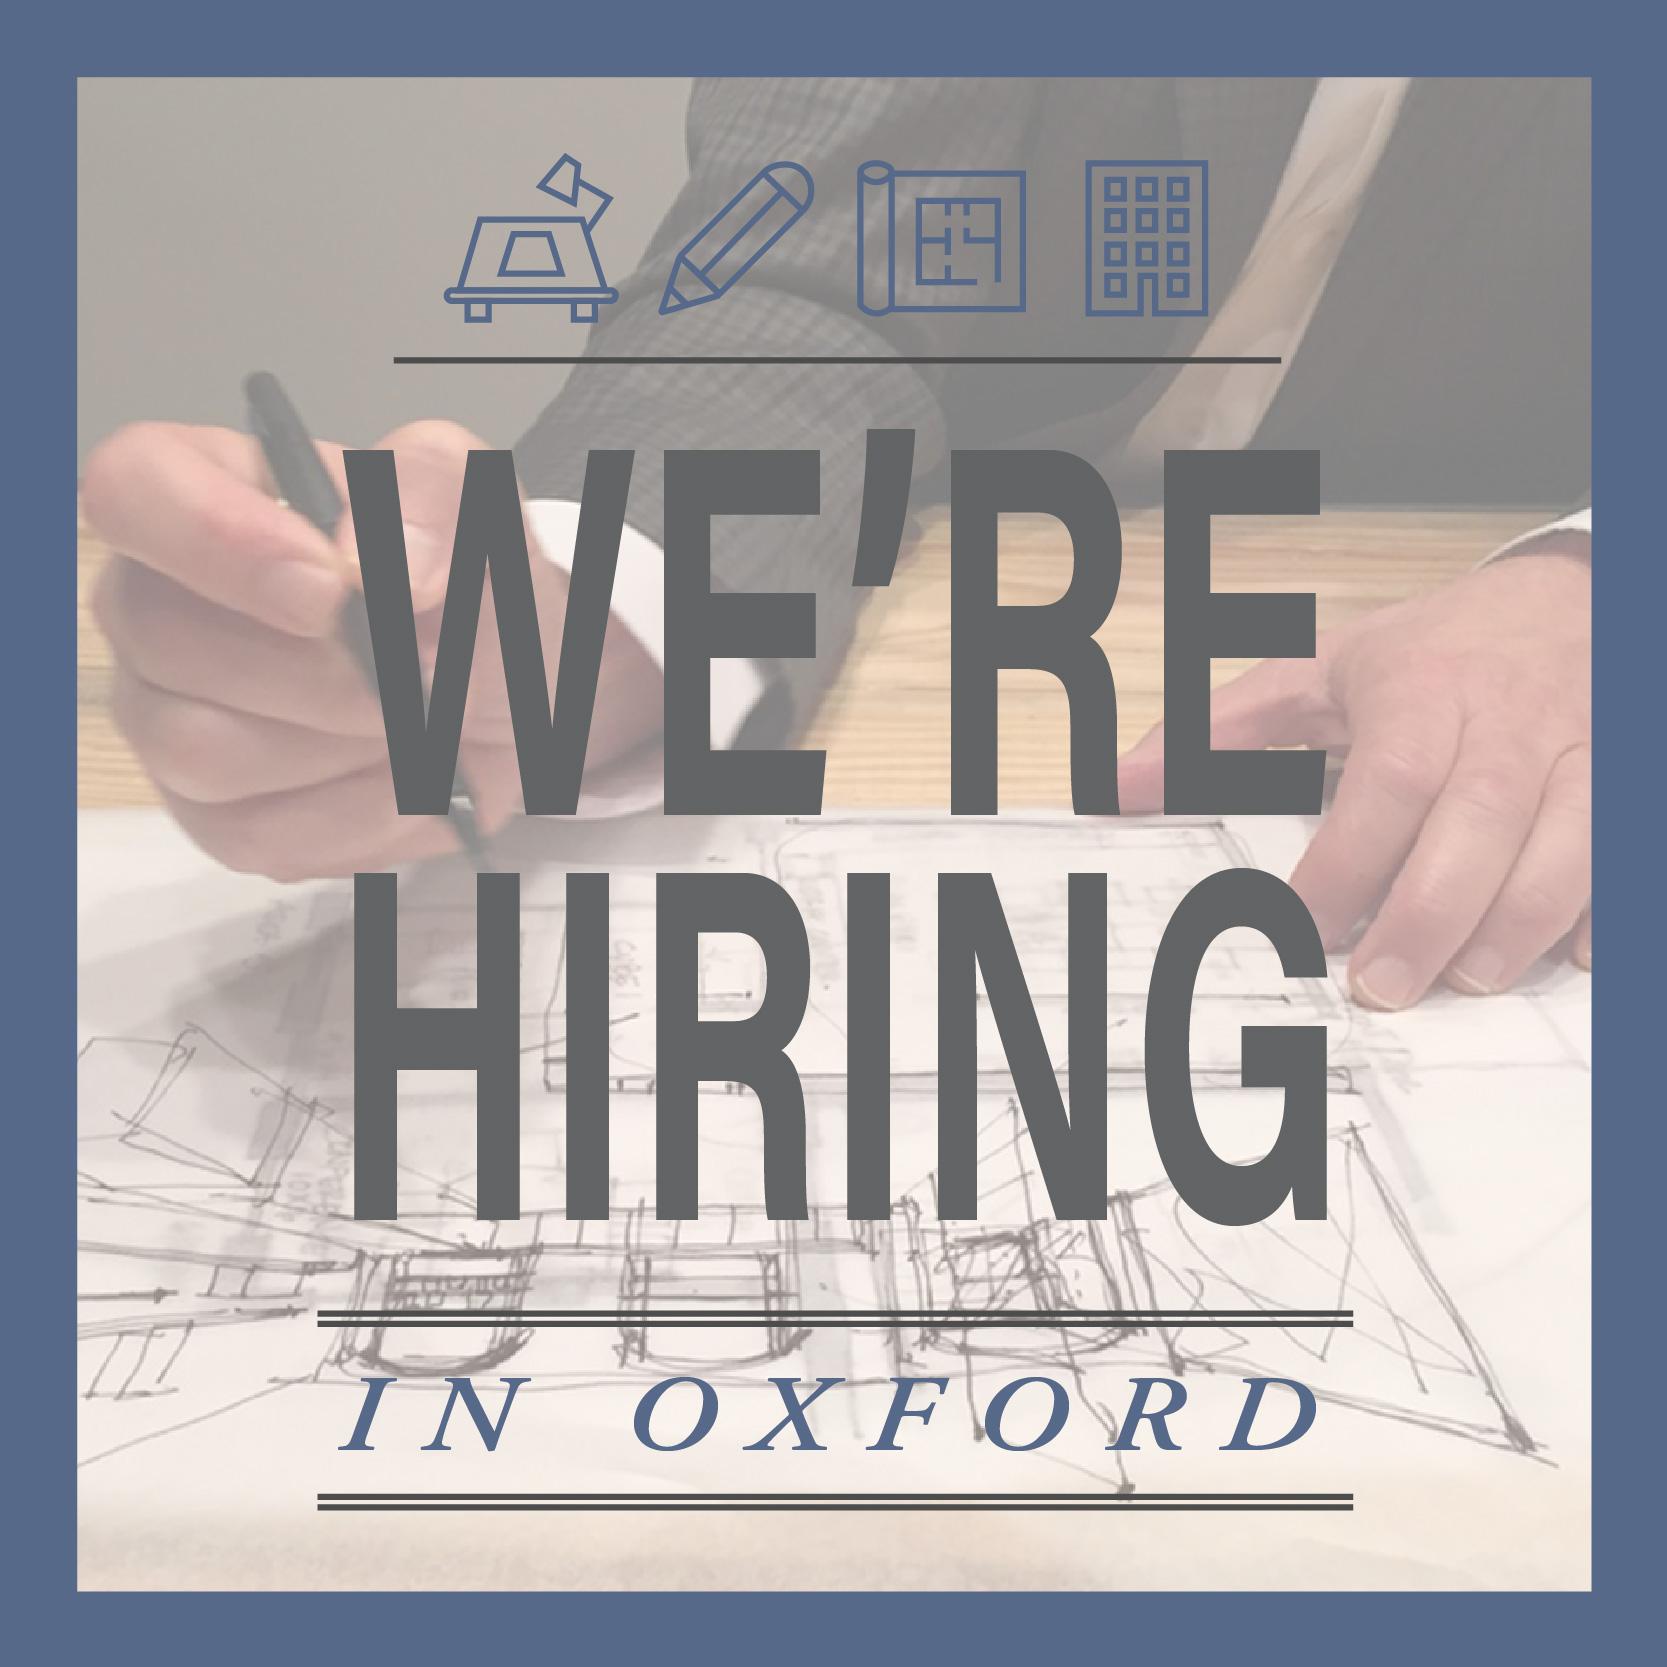 We are hiring ad-01.jpg